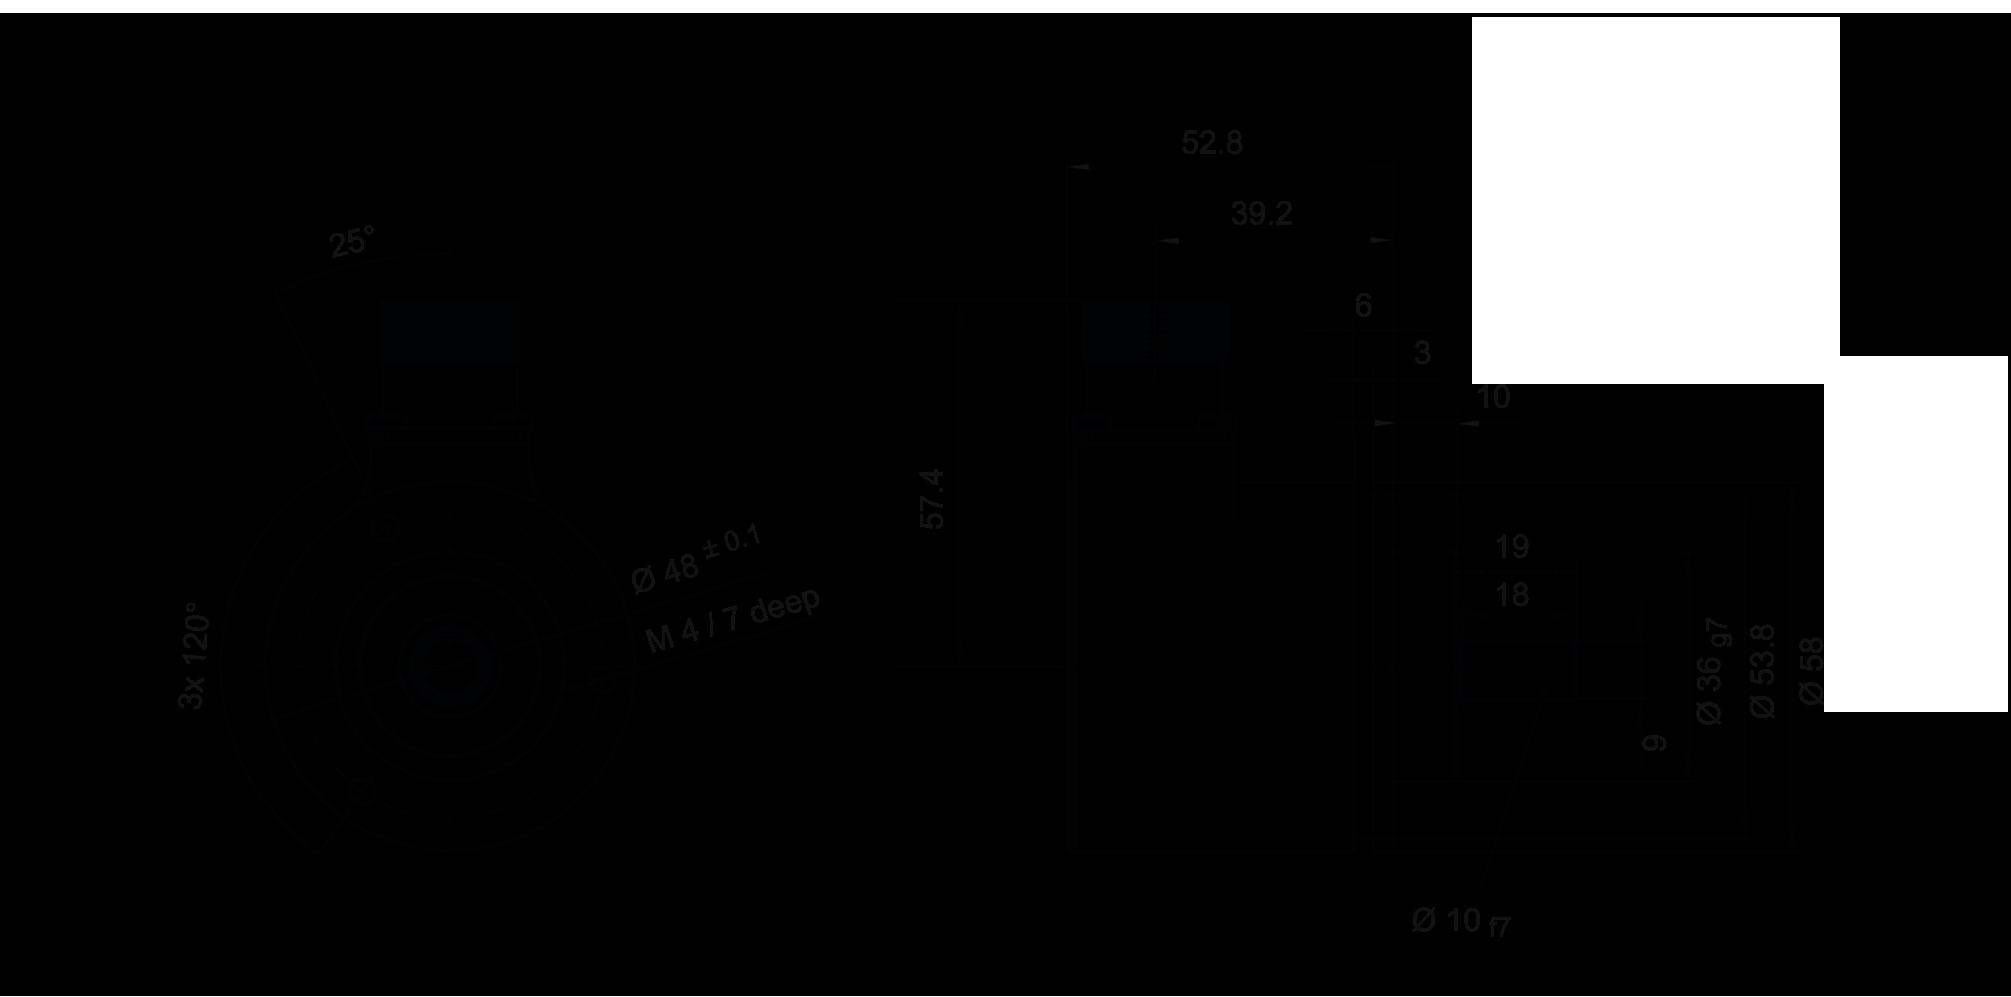 inductive proximity sensor wiring diagrams